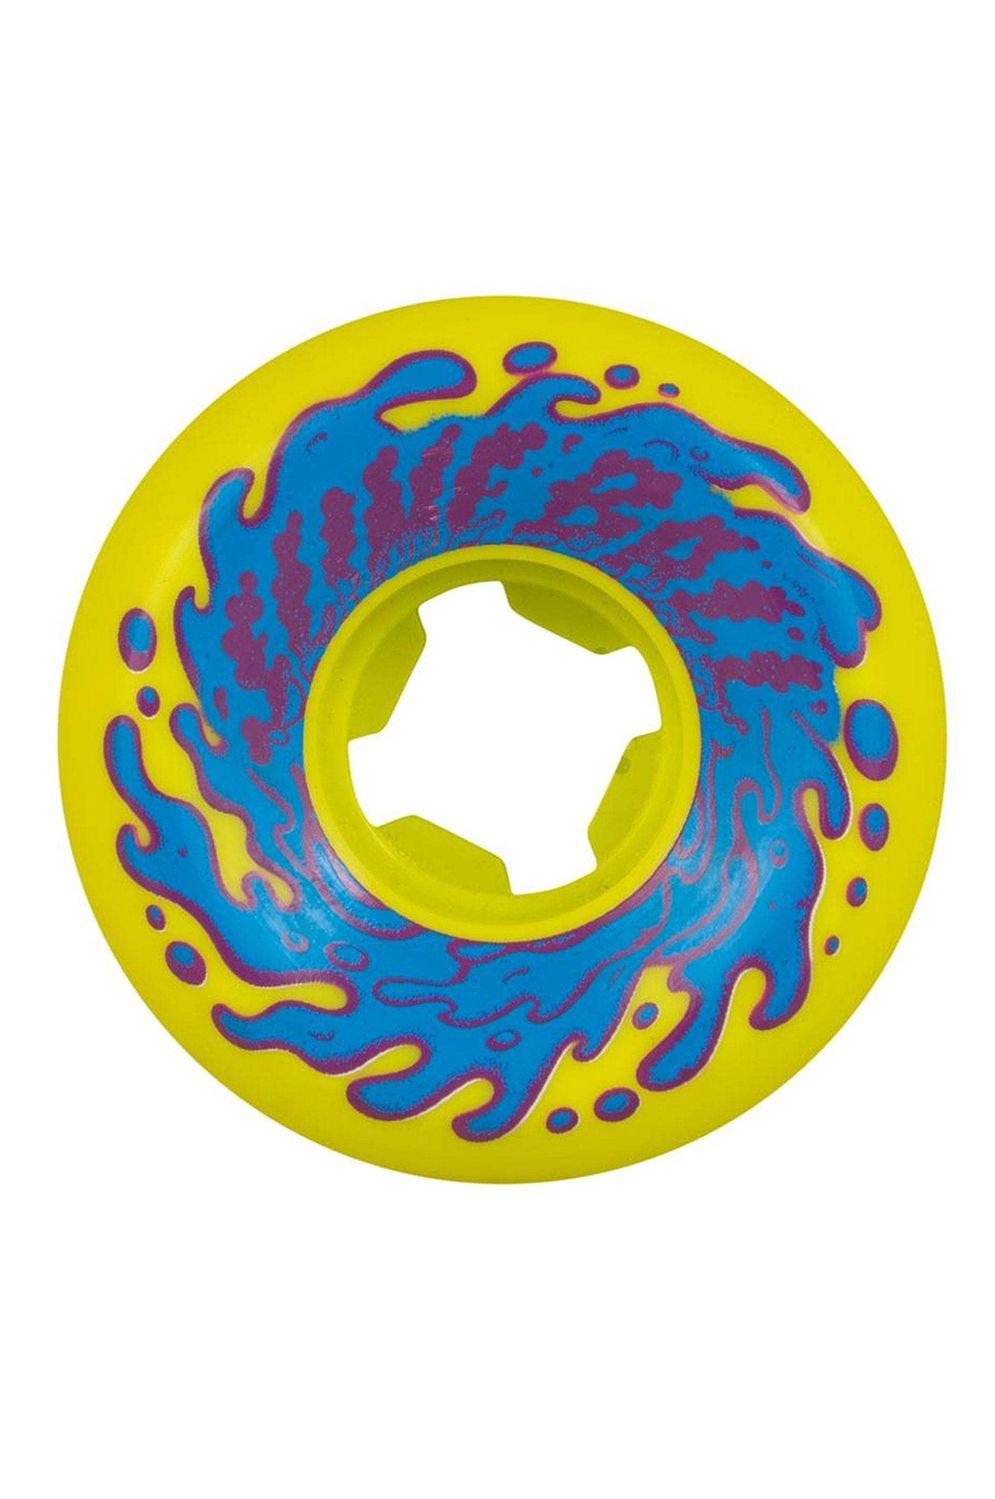 Rodas Slime Balls 53MM DOUBLE TAKE VOMIT MINI 97A Yellow